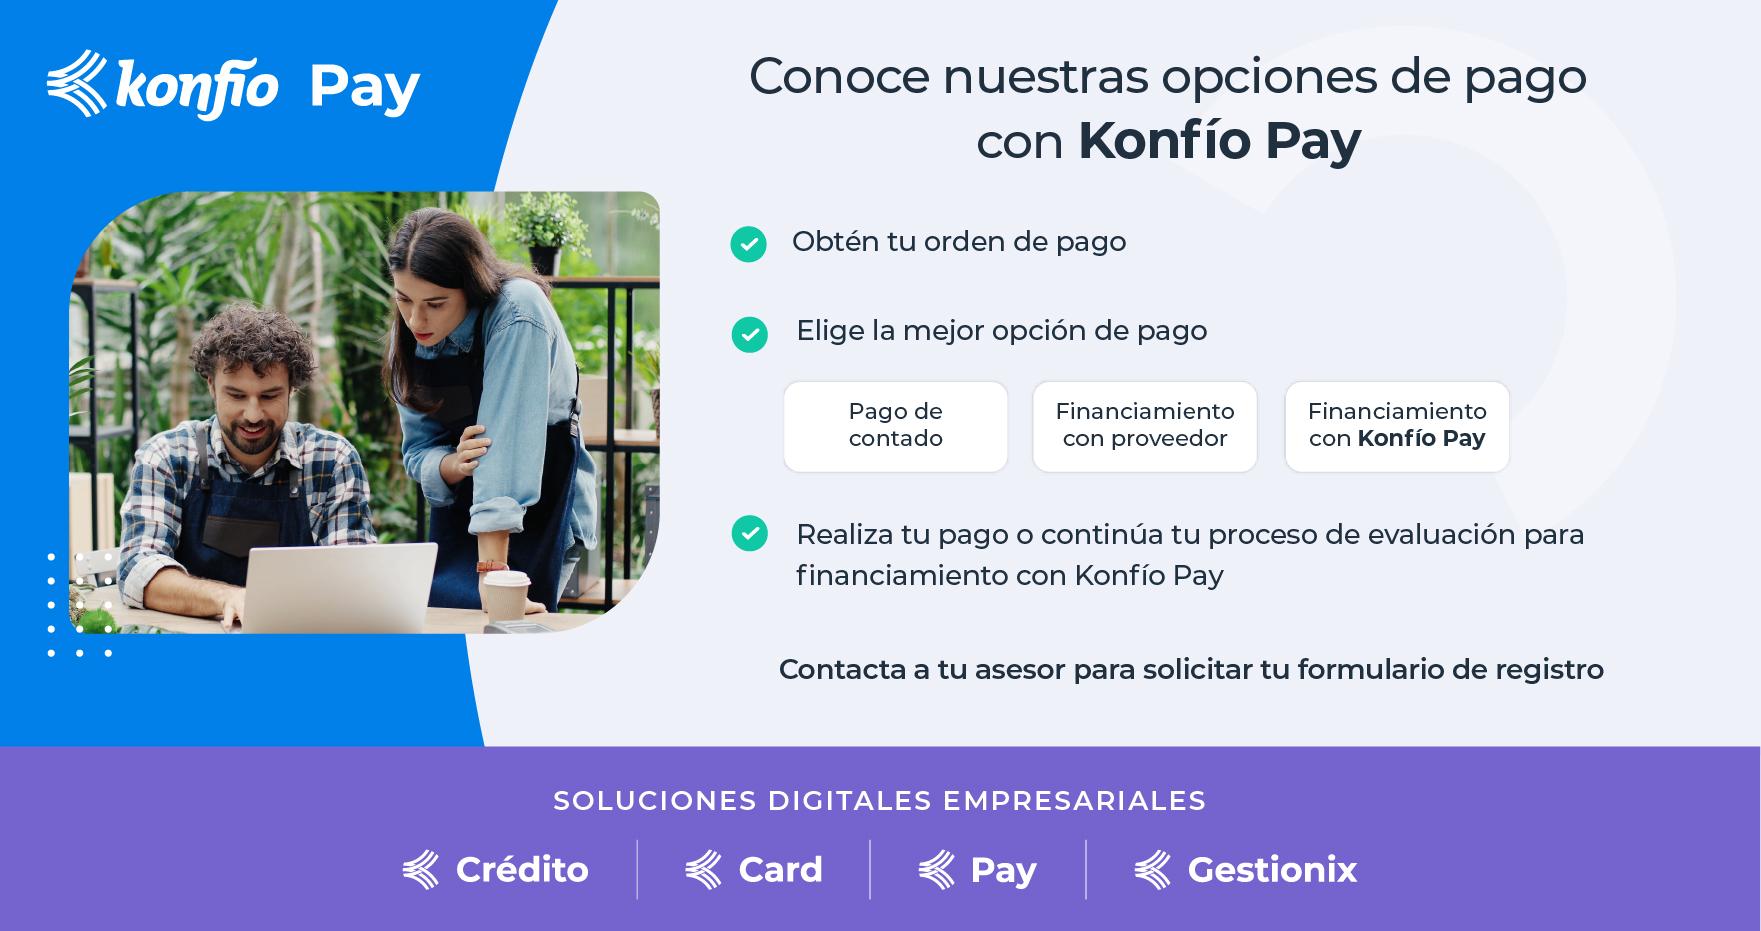 pm-pay-cliente-b-orden-copia.jpg